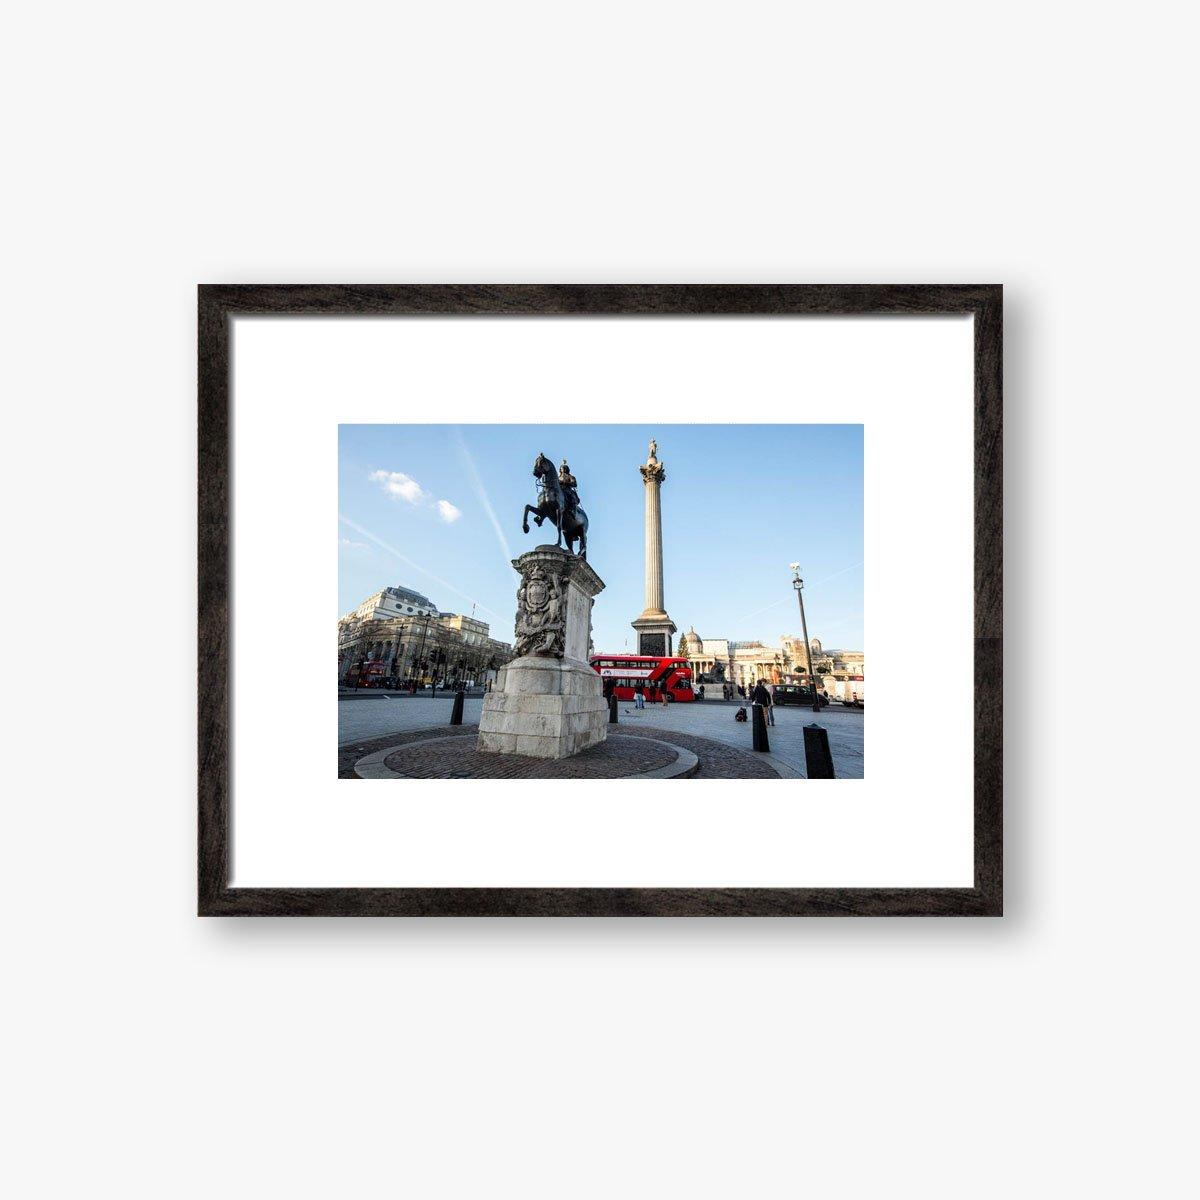 Trafalgar Square by Alex Lentati